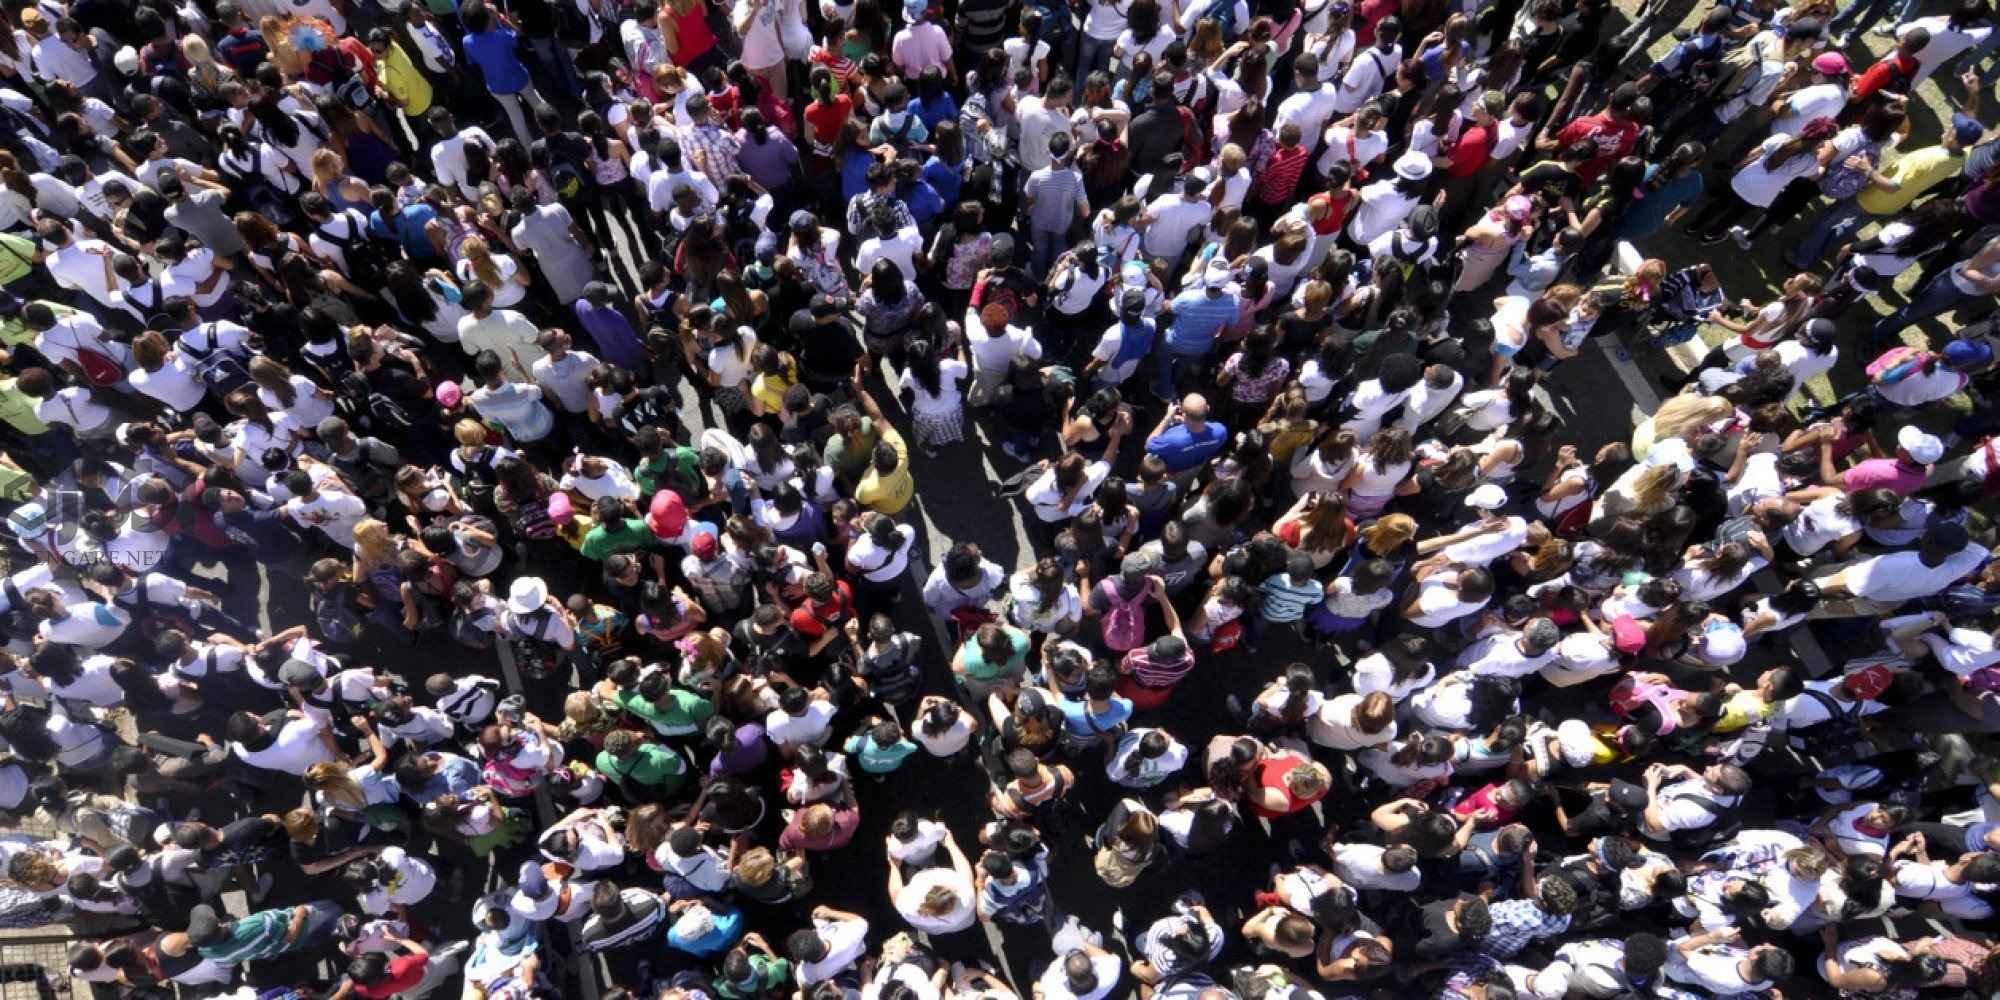 DC2I8URUAAApoRN 1 - غارتگری اجتماعی؛ چرا مردم طمع میکنند؟ - نوربرت الیاس, نعمت الله فاضلی, میشل فوکو, قانون, فرهنگ, غارتگری اجتماعی, جامعه